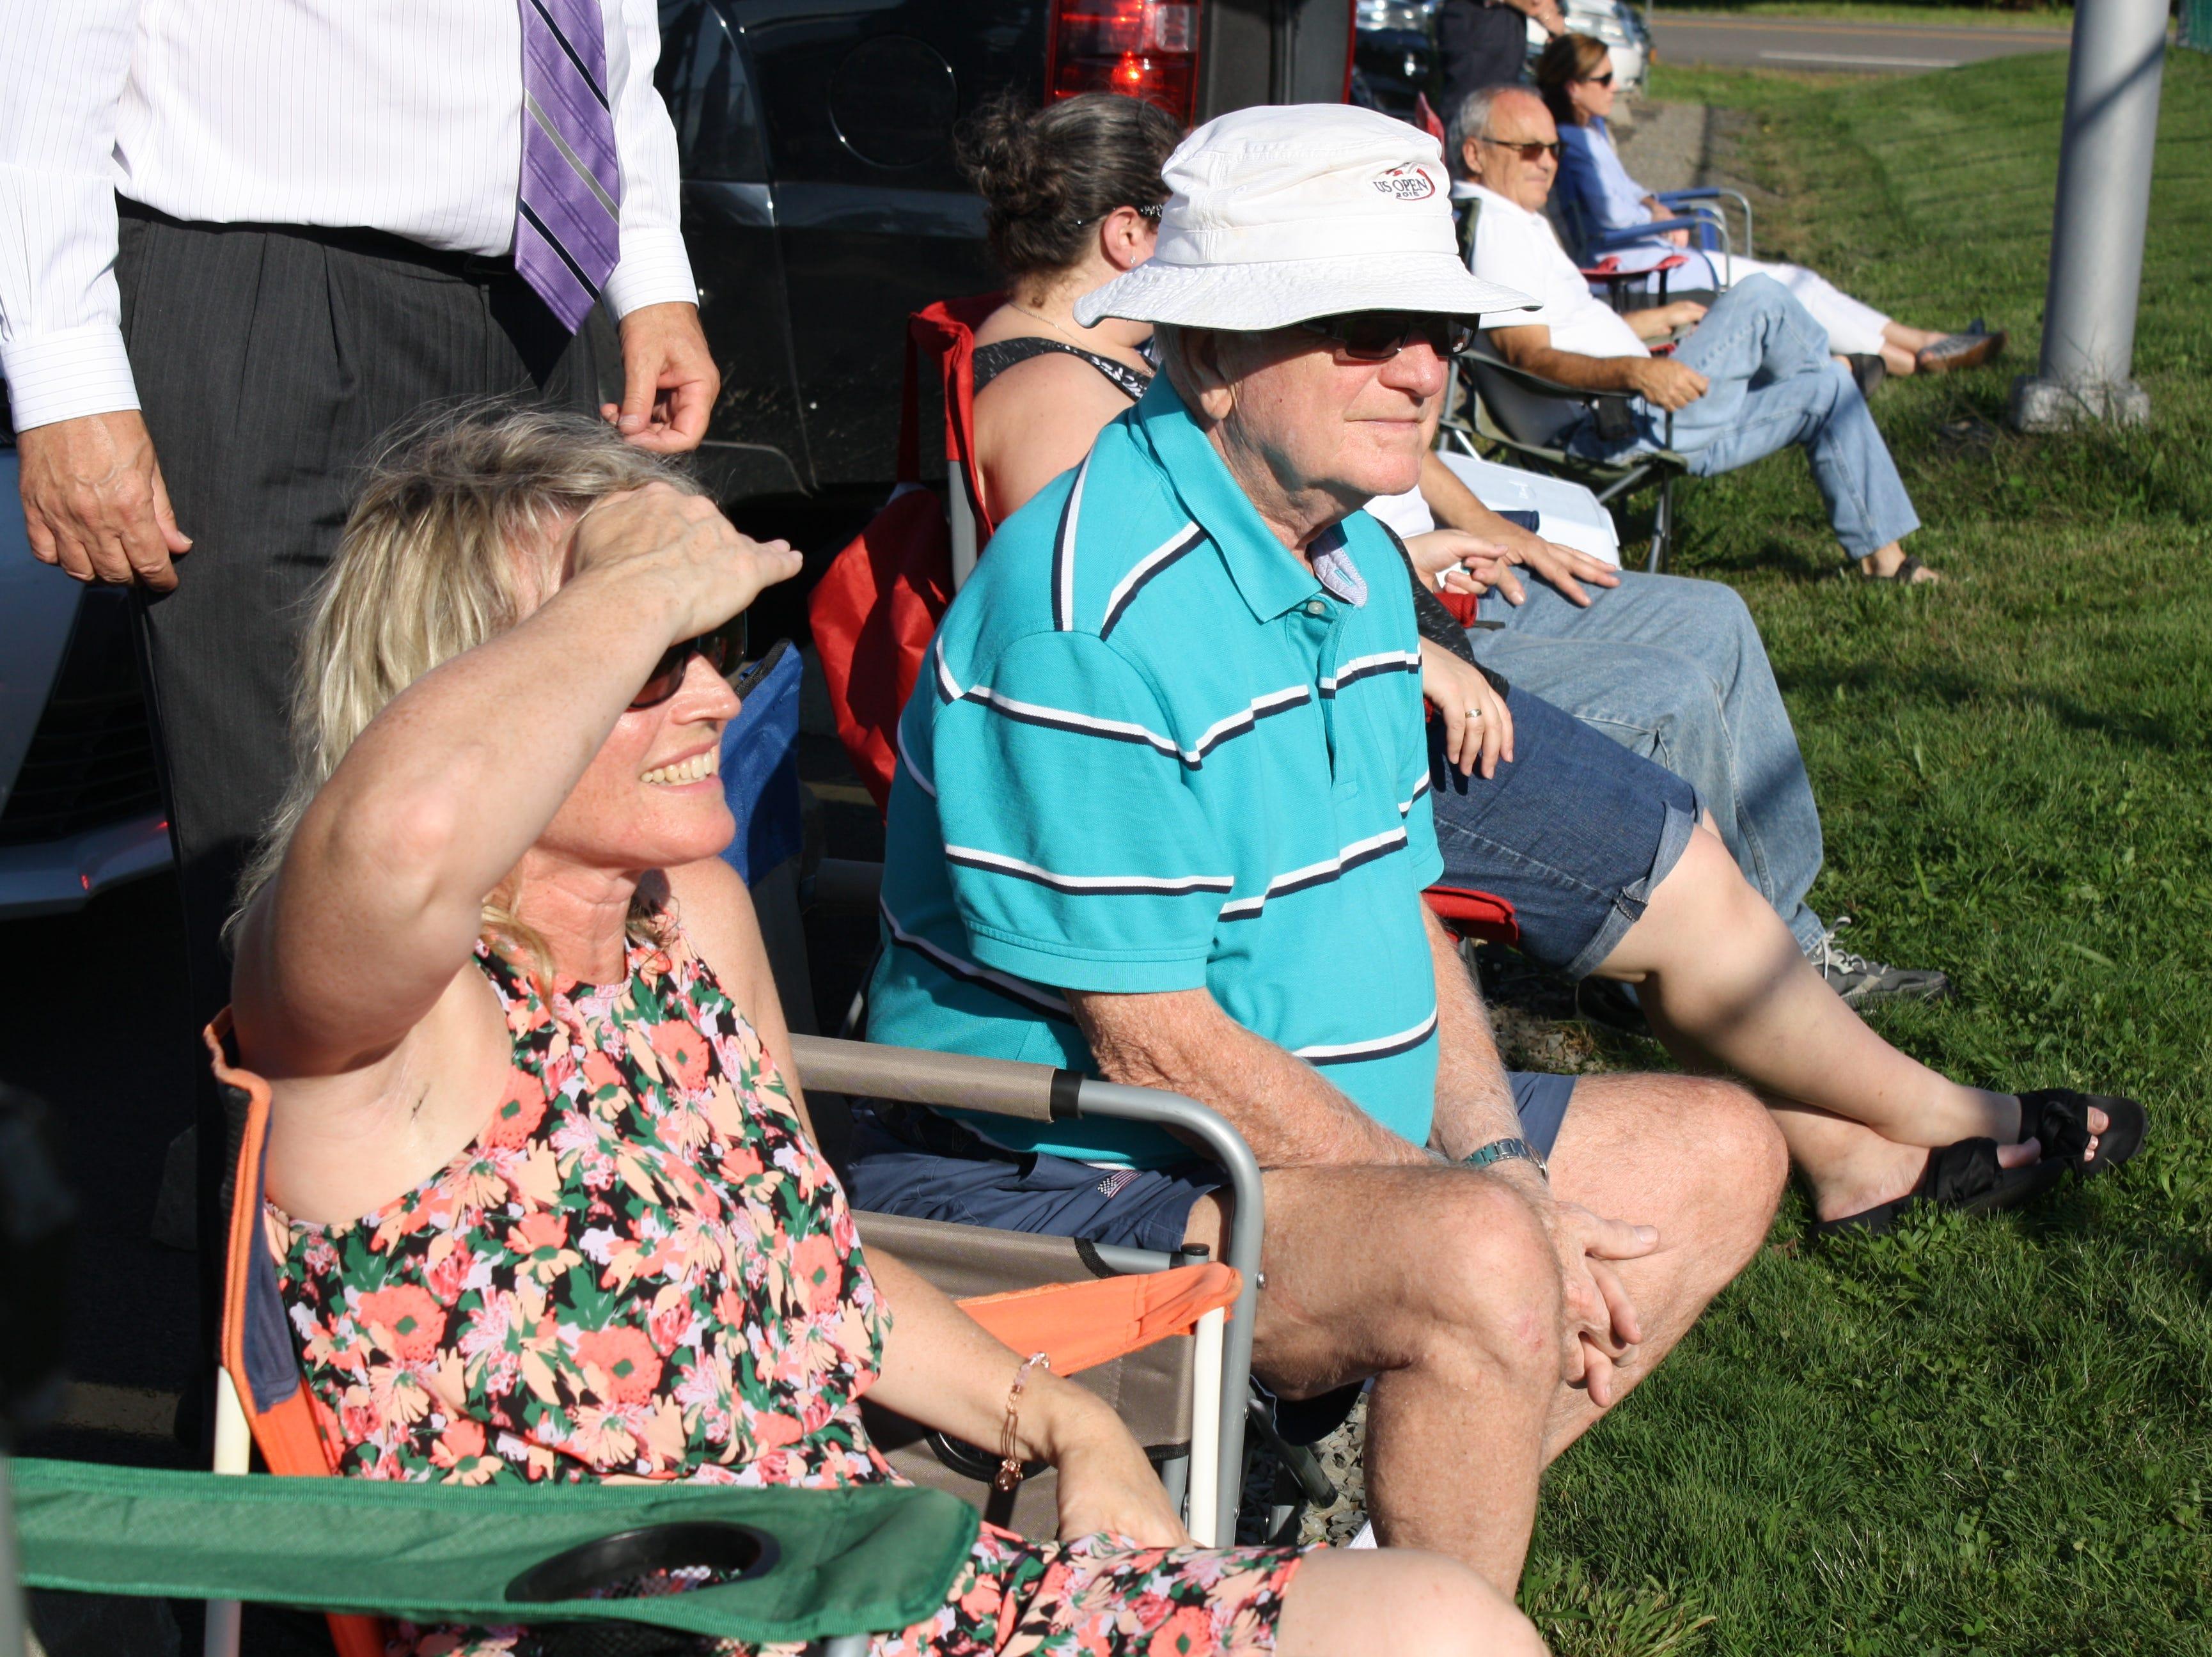 Julia Miller and her father, Joe McCann, cheer on Seton Catholic High School junior Julianna Miller, 16, as she competes in a singles tennis match against Windsor's girls varsity tennis team on Sept. 18.